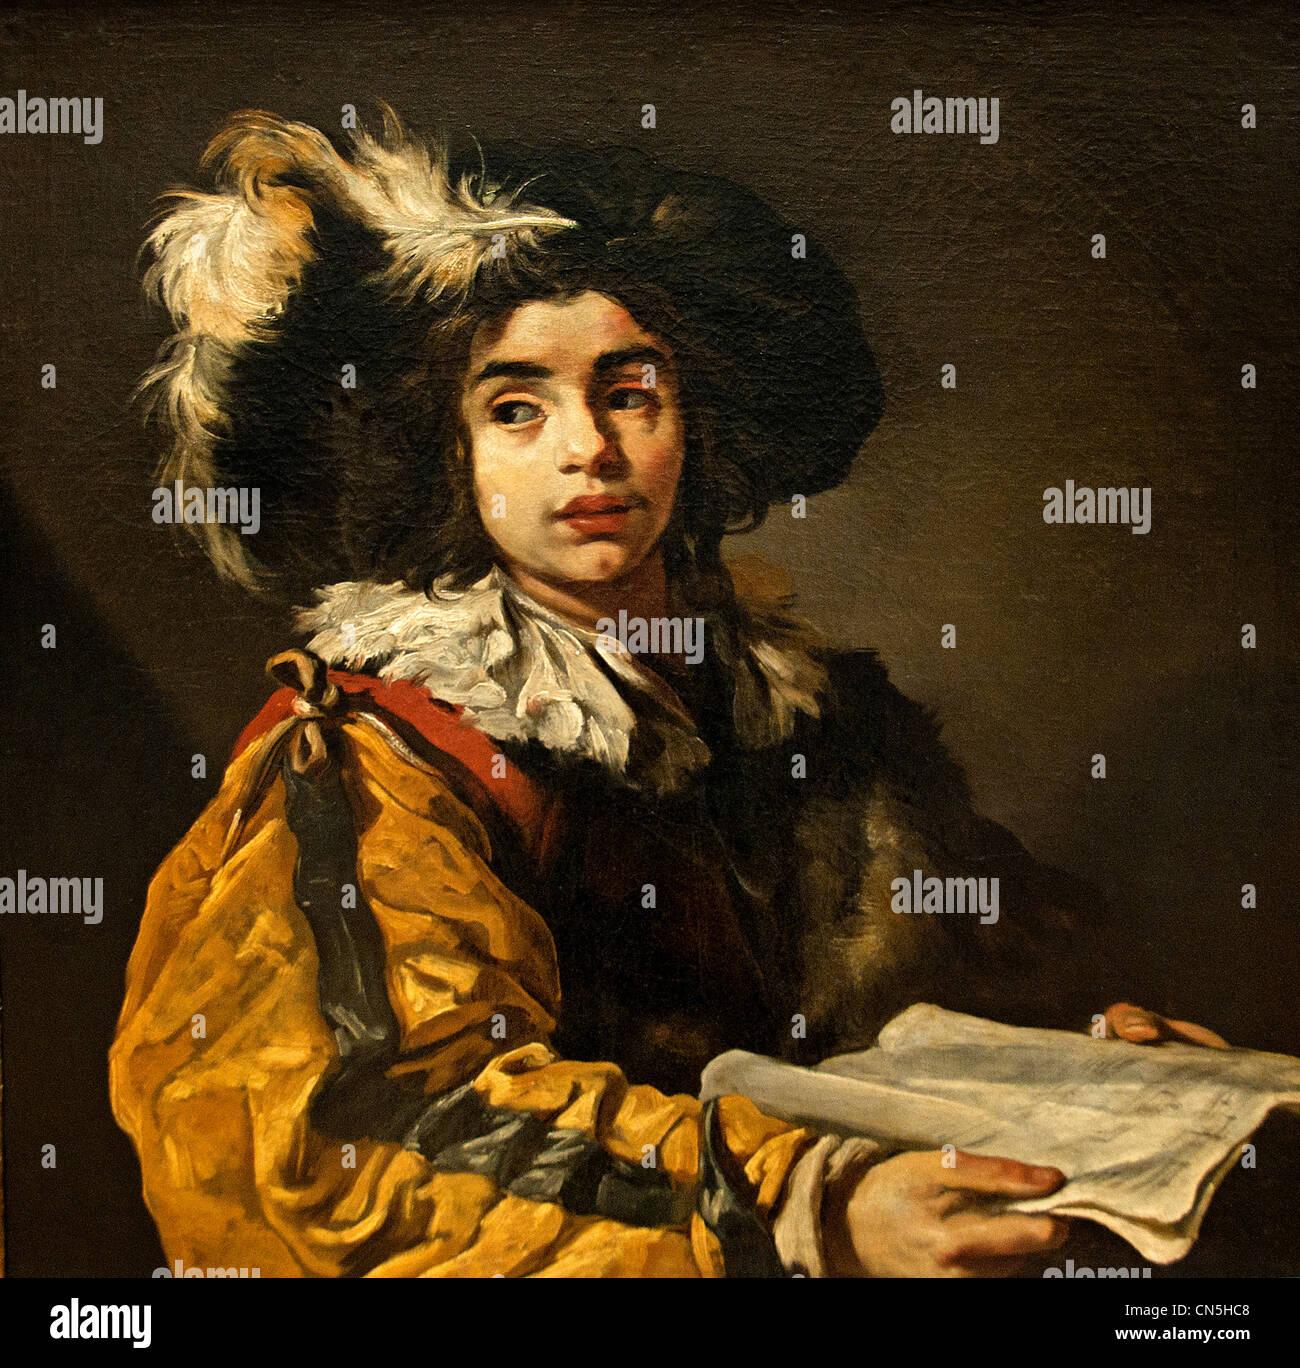 Le Jeune Chanteur - The Young Singer 1622 by Claude Vignon 1593-1670 France French - Stock Image